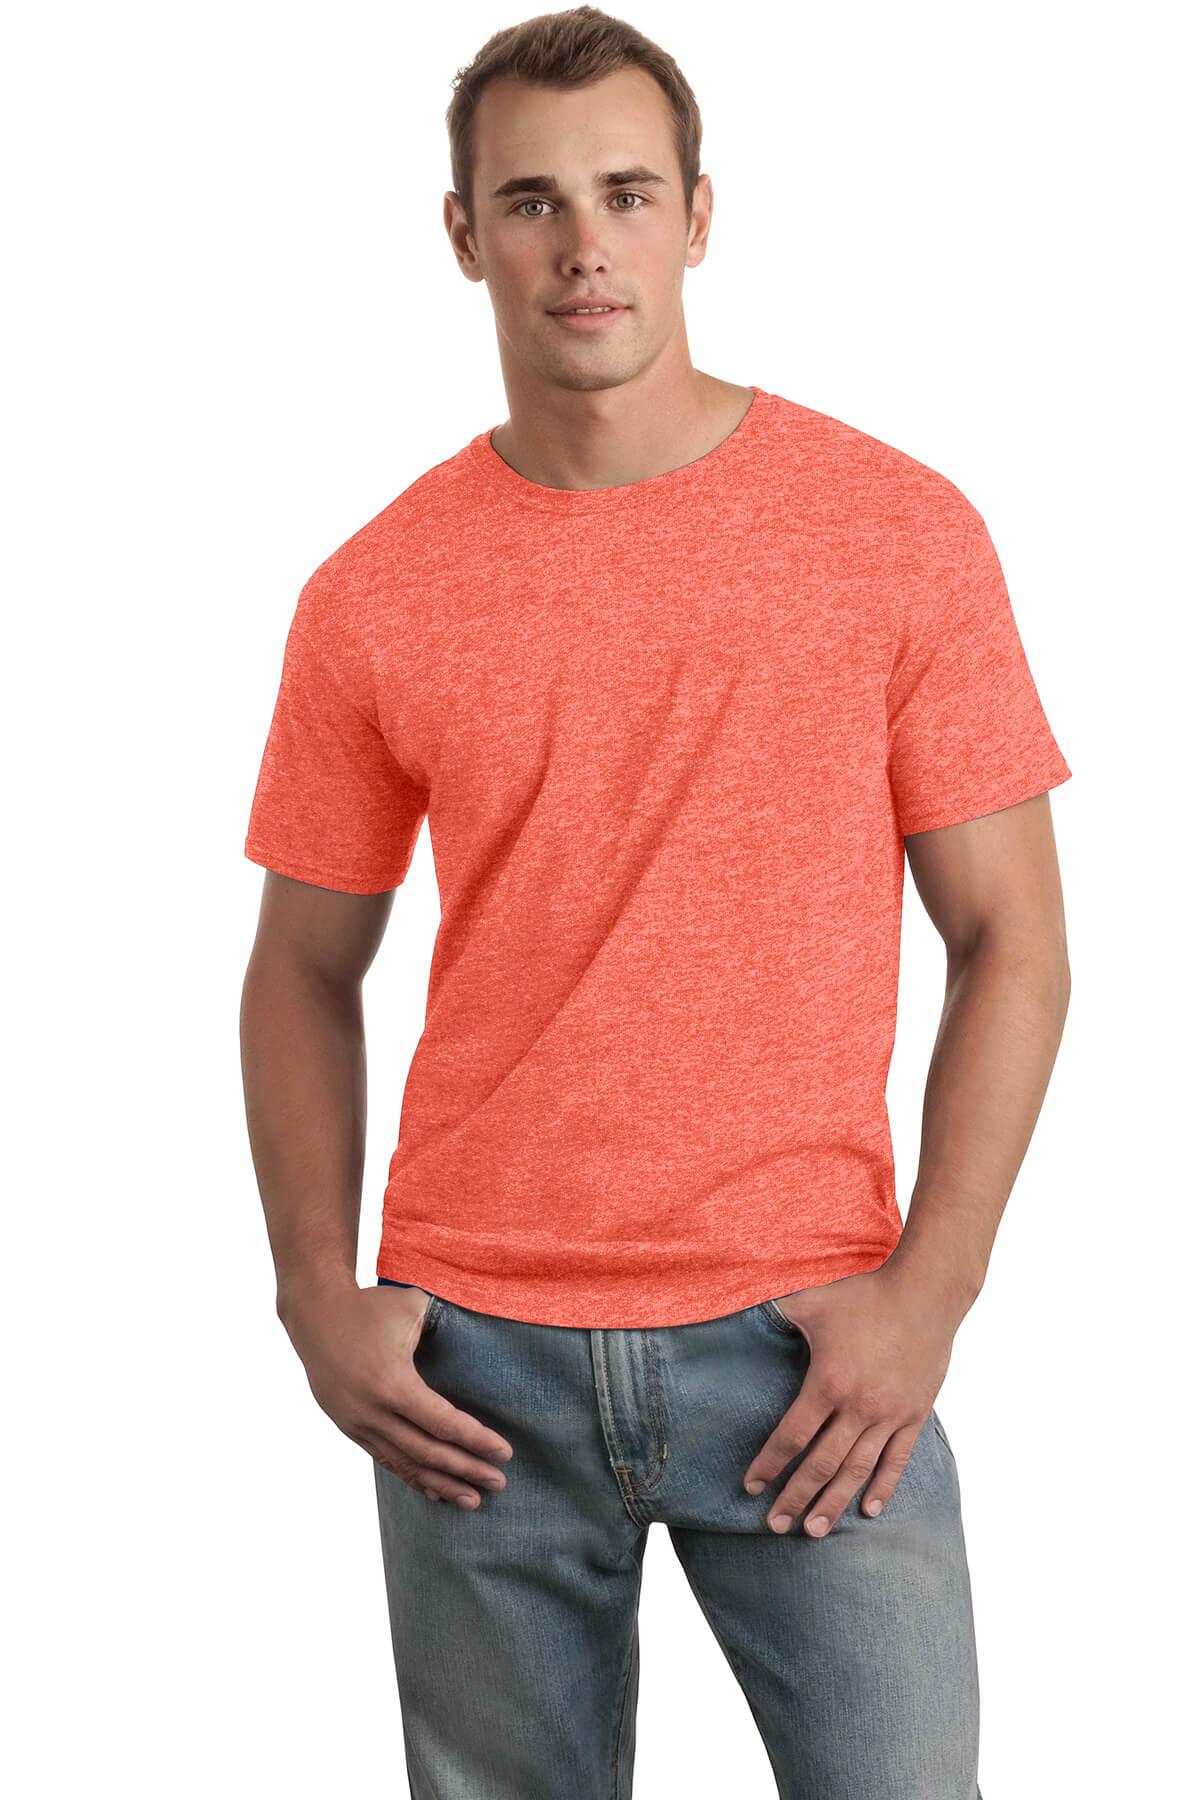 Heather Orange T-Shirt Model Front